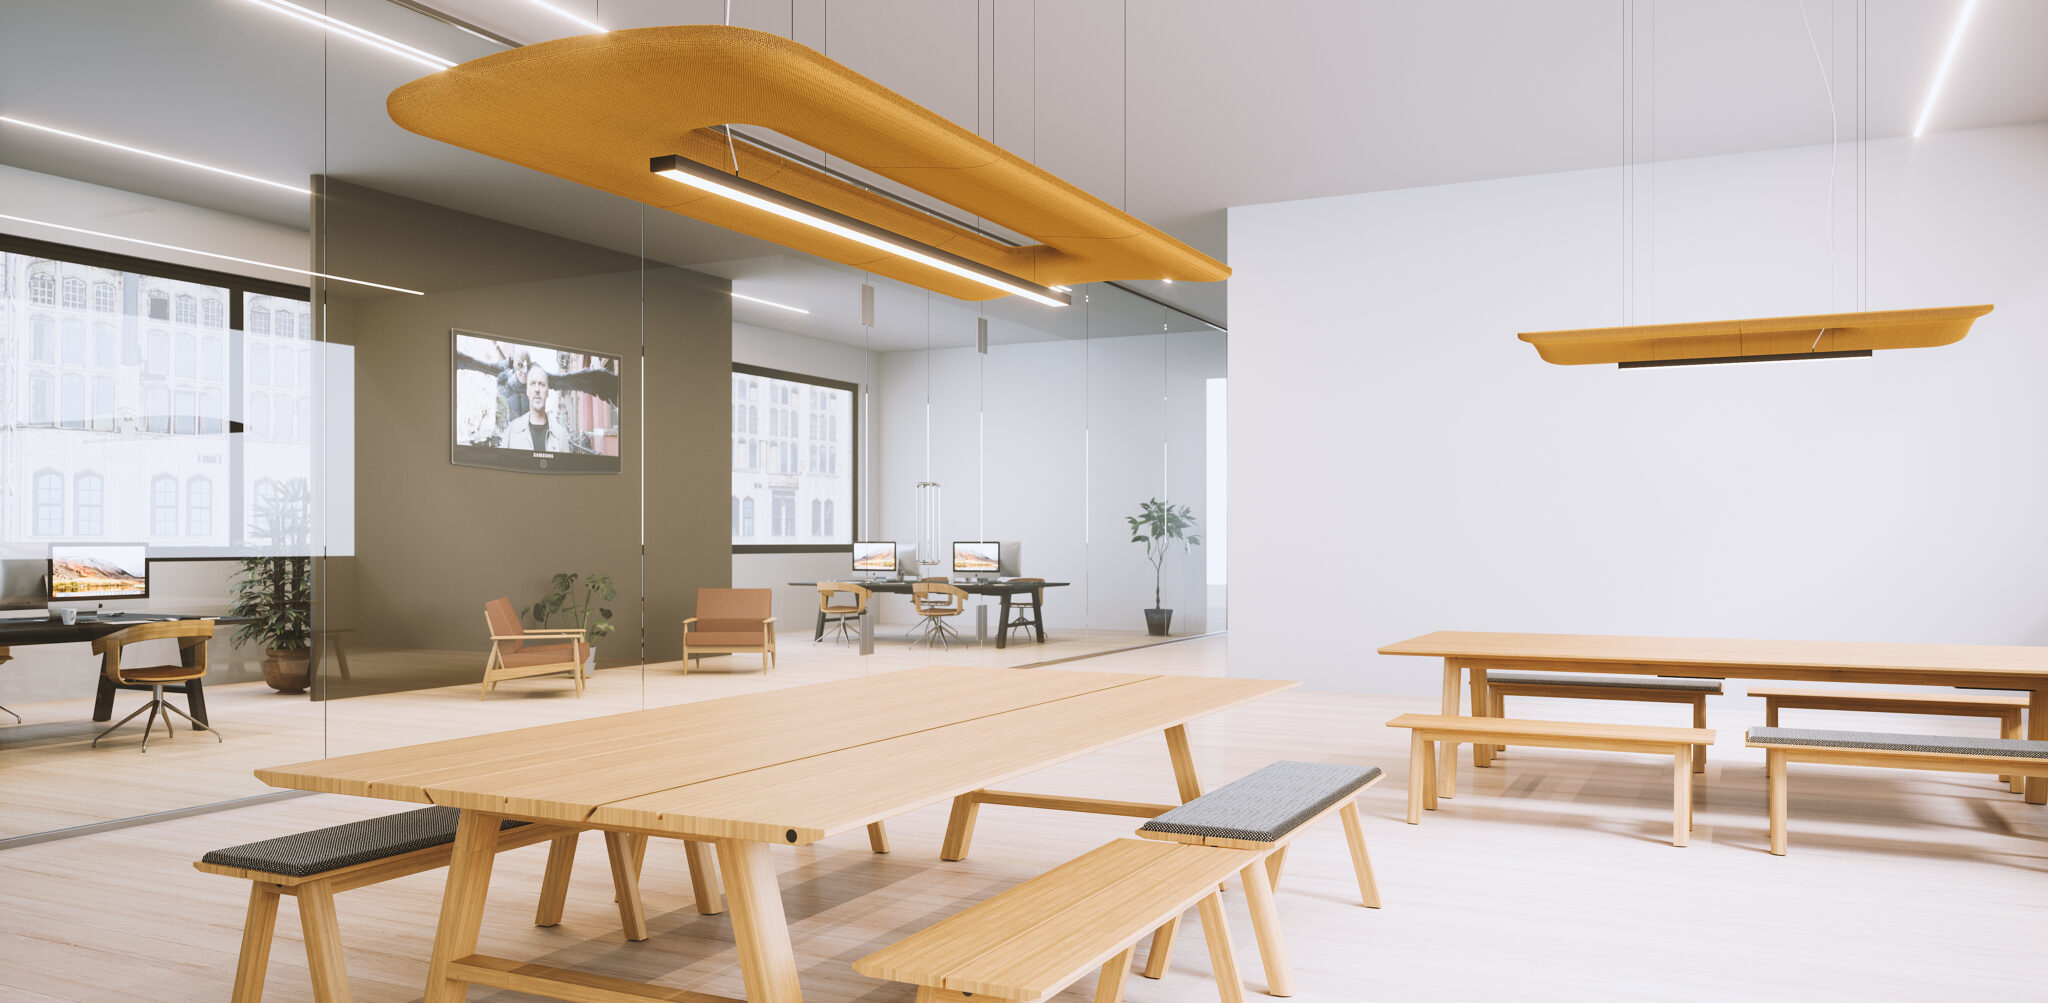 akoestisch plafond Heering Office Den Haag